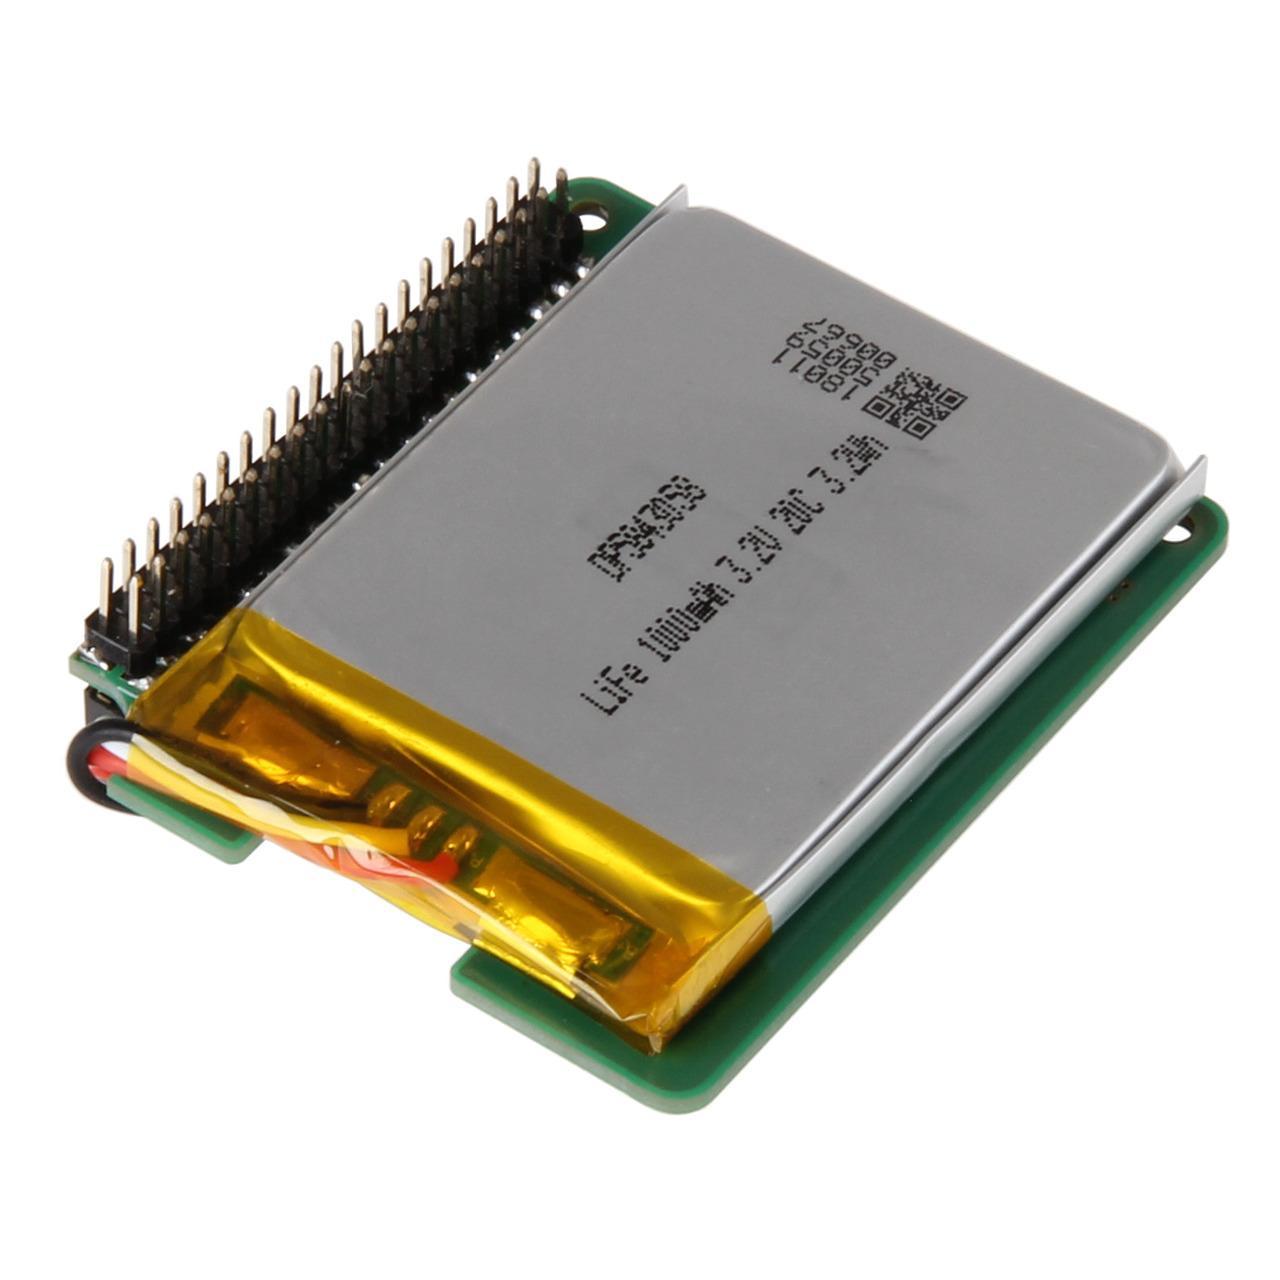 Joy-IT LiFePo4-Akku für StromPi 3, 1000 mAh